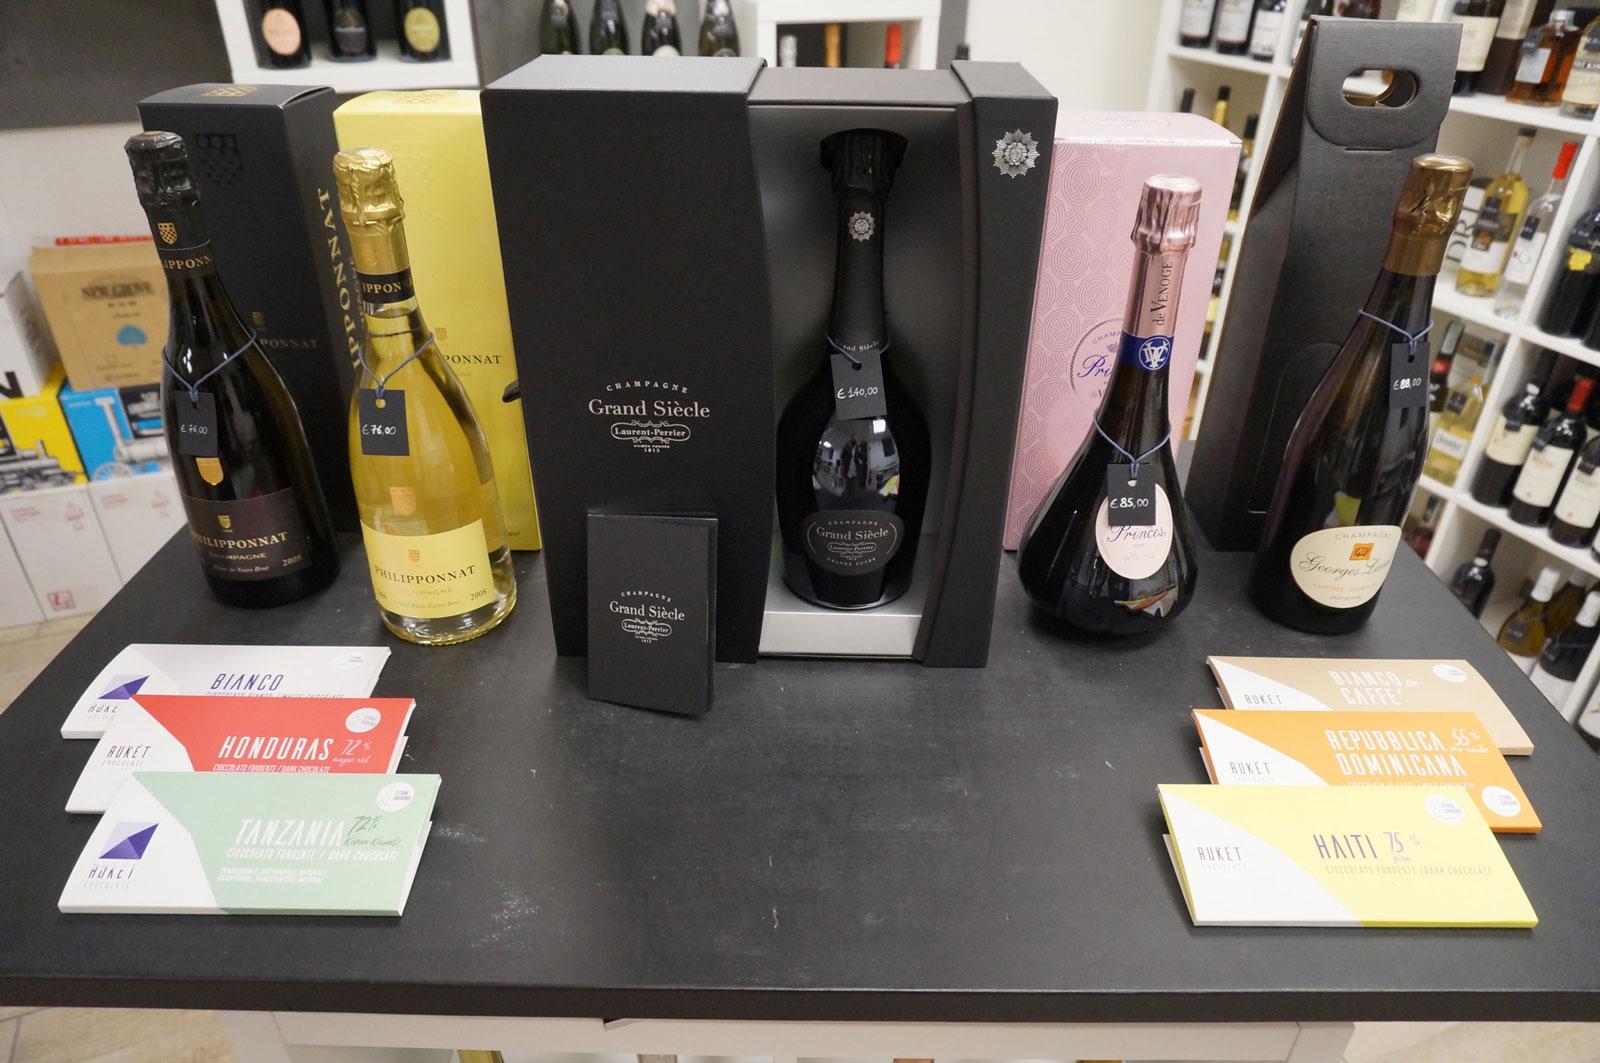 Botrytis Enoteca vini, bottiglie di Grand Siecle, Philiponnat